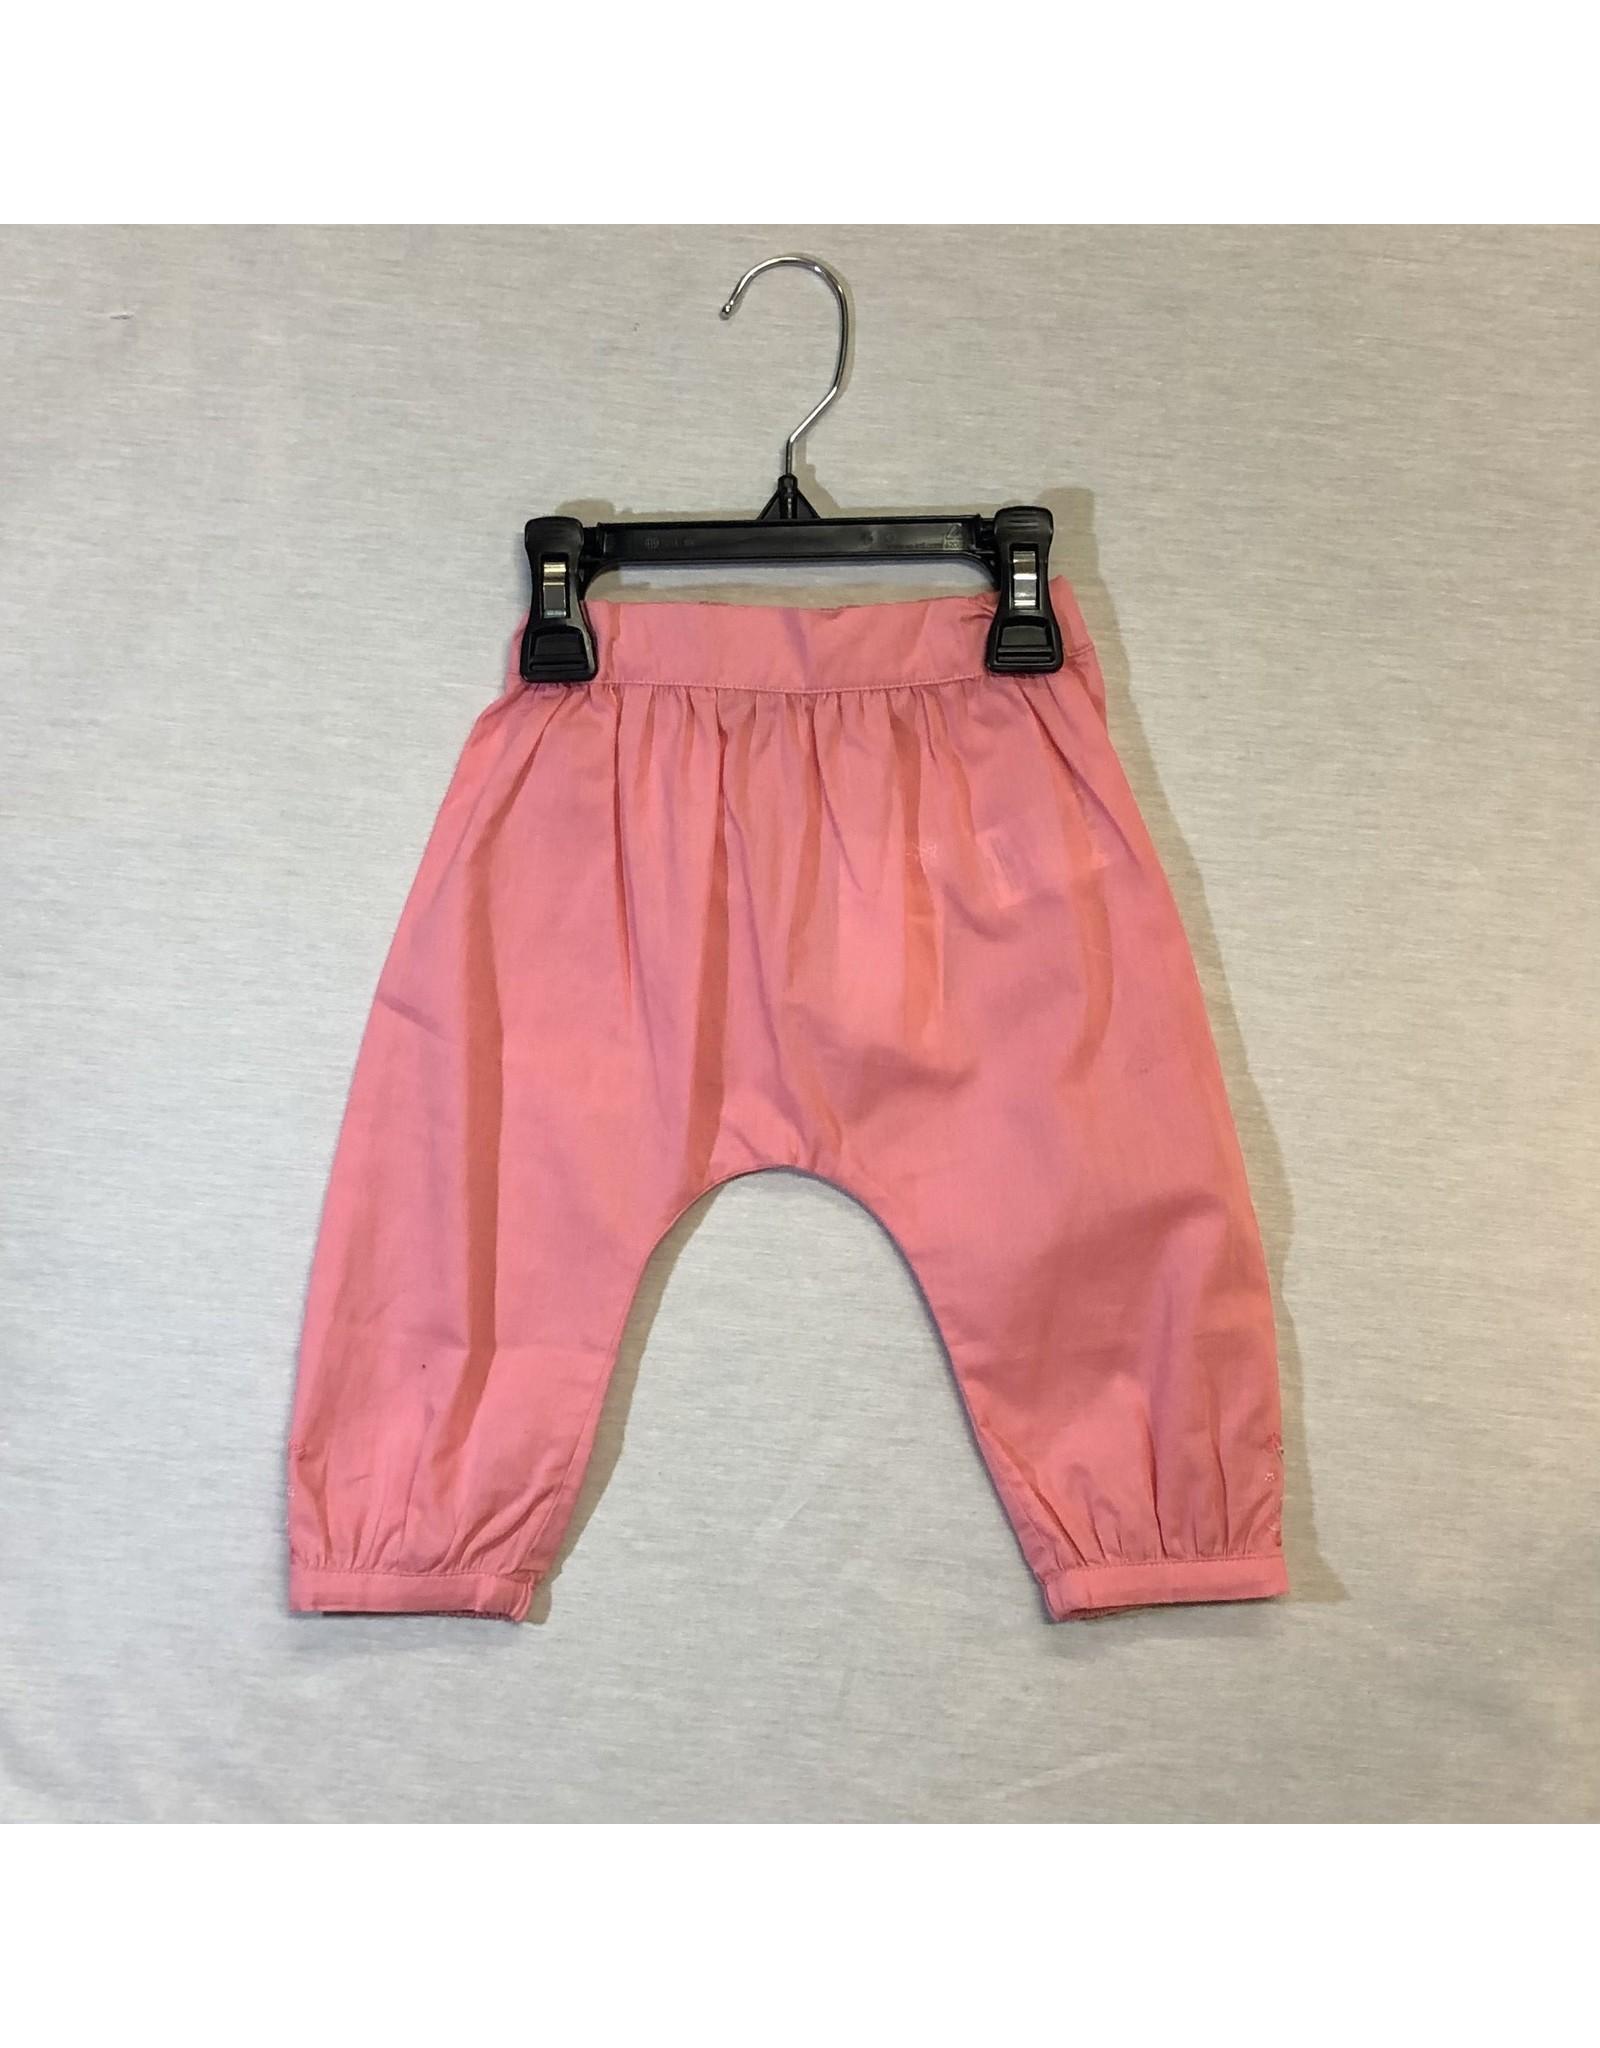 Tartine Et Chocolat Pink Pants with Flower Detail